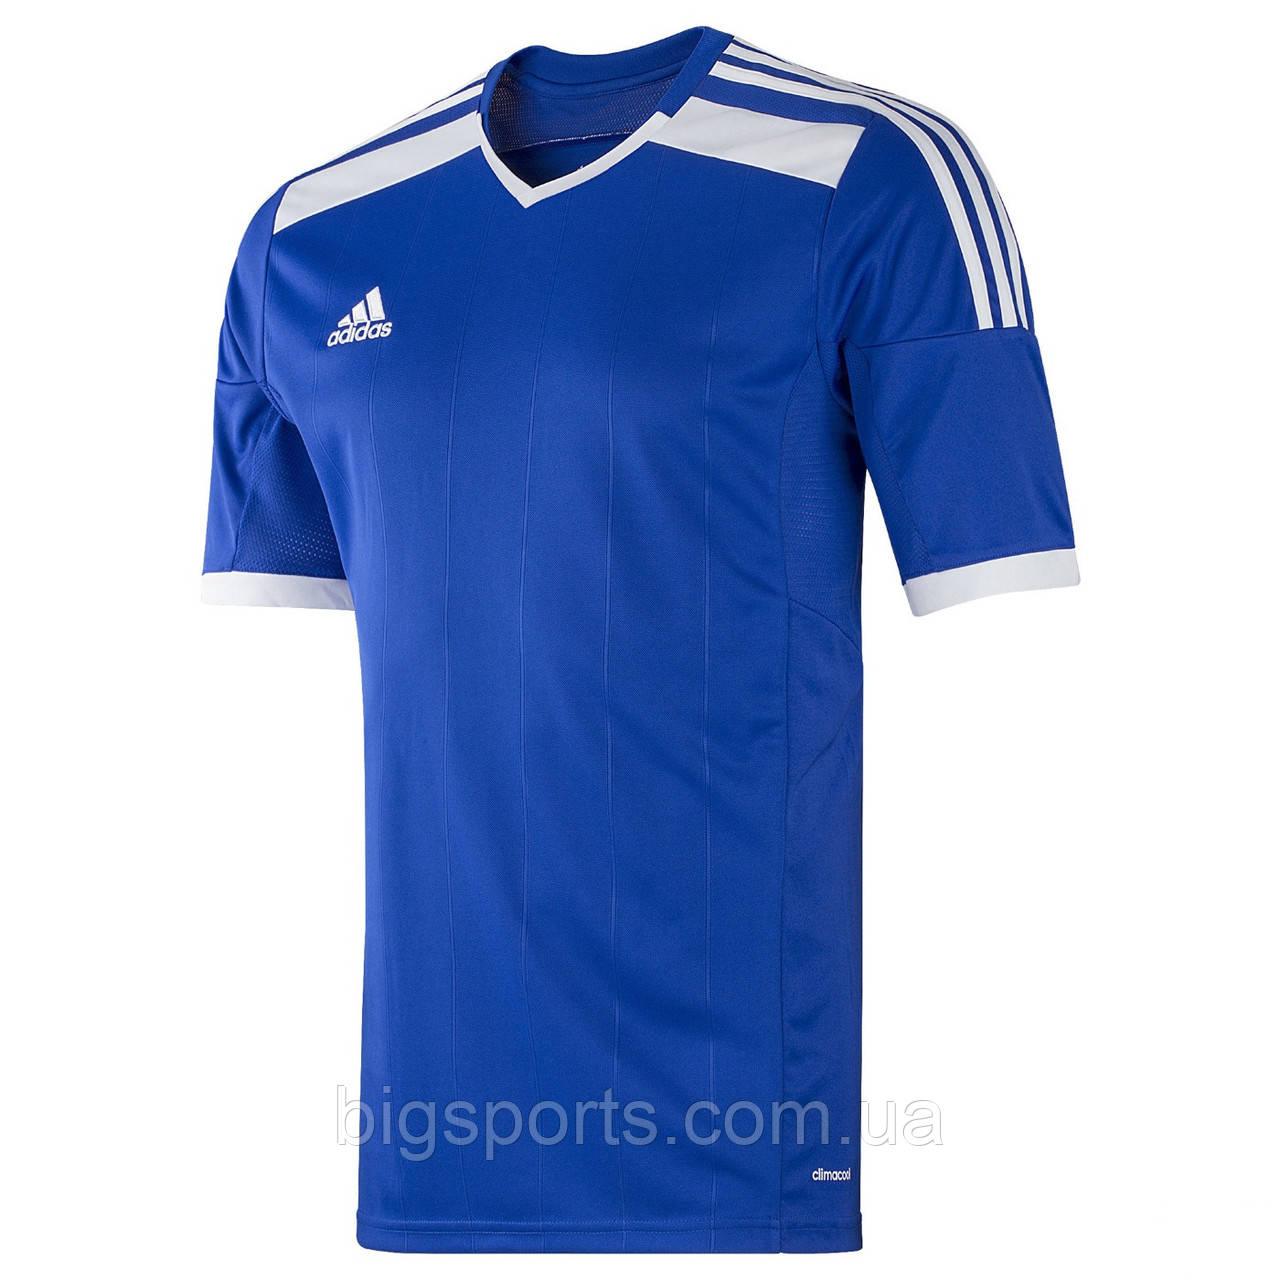 Футболка муж. Adidas REGI 14 JSY (арт. F50009)